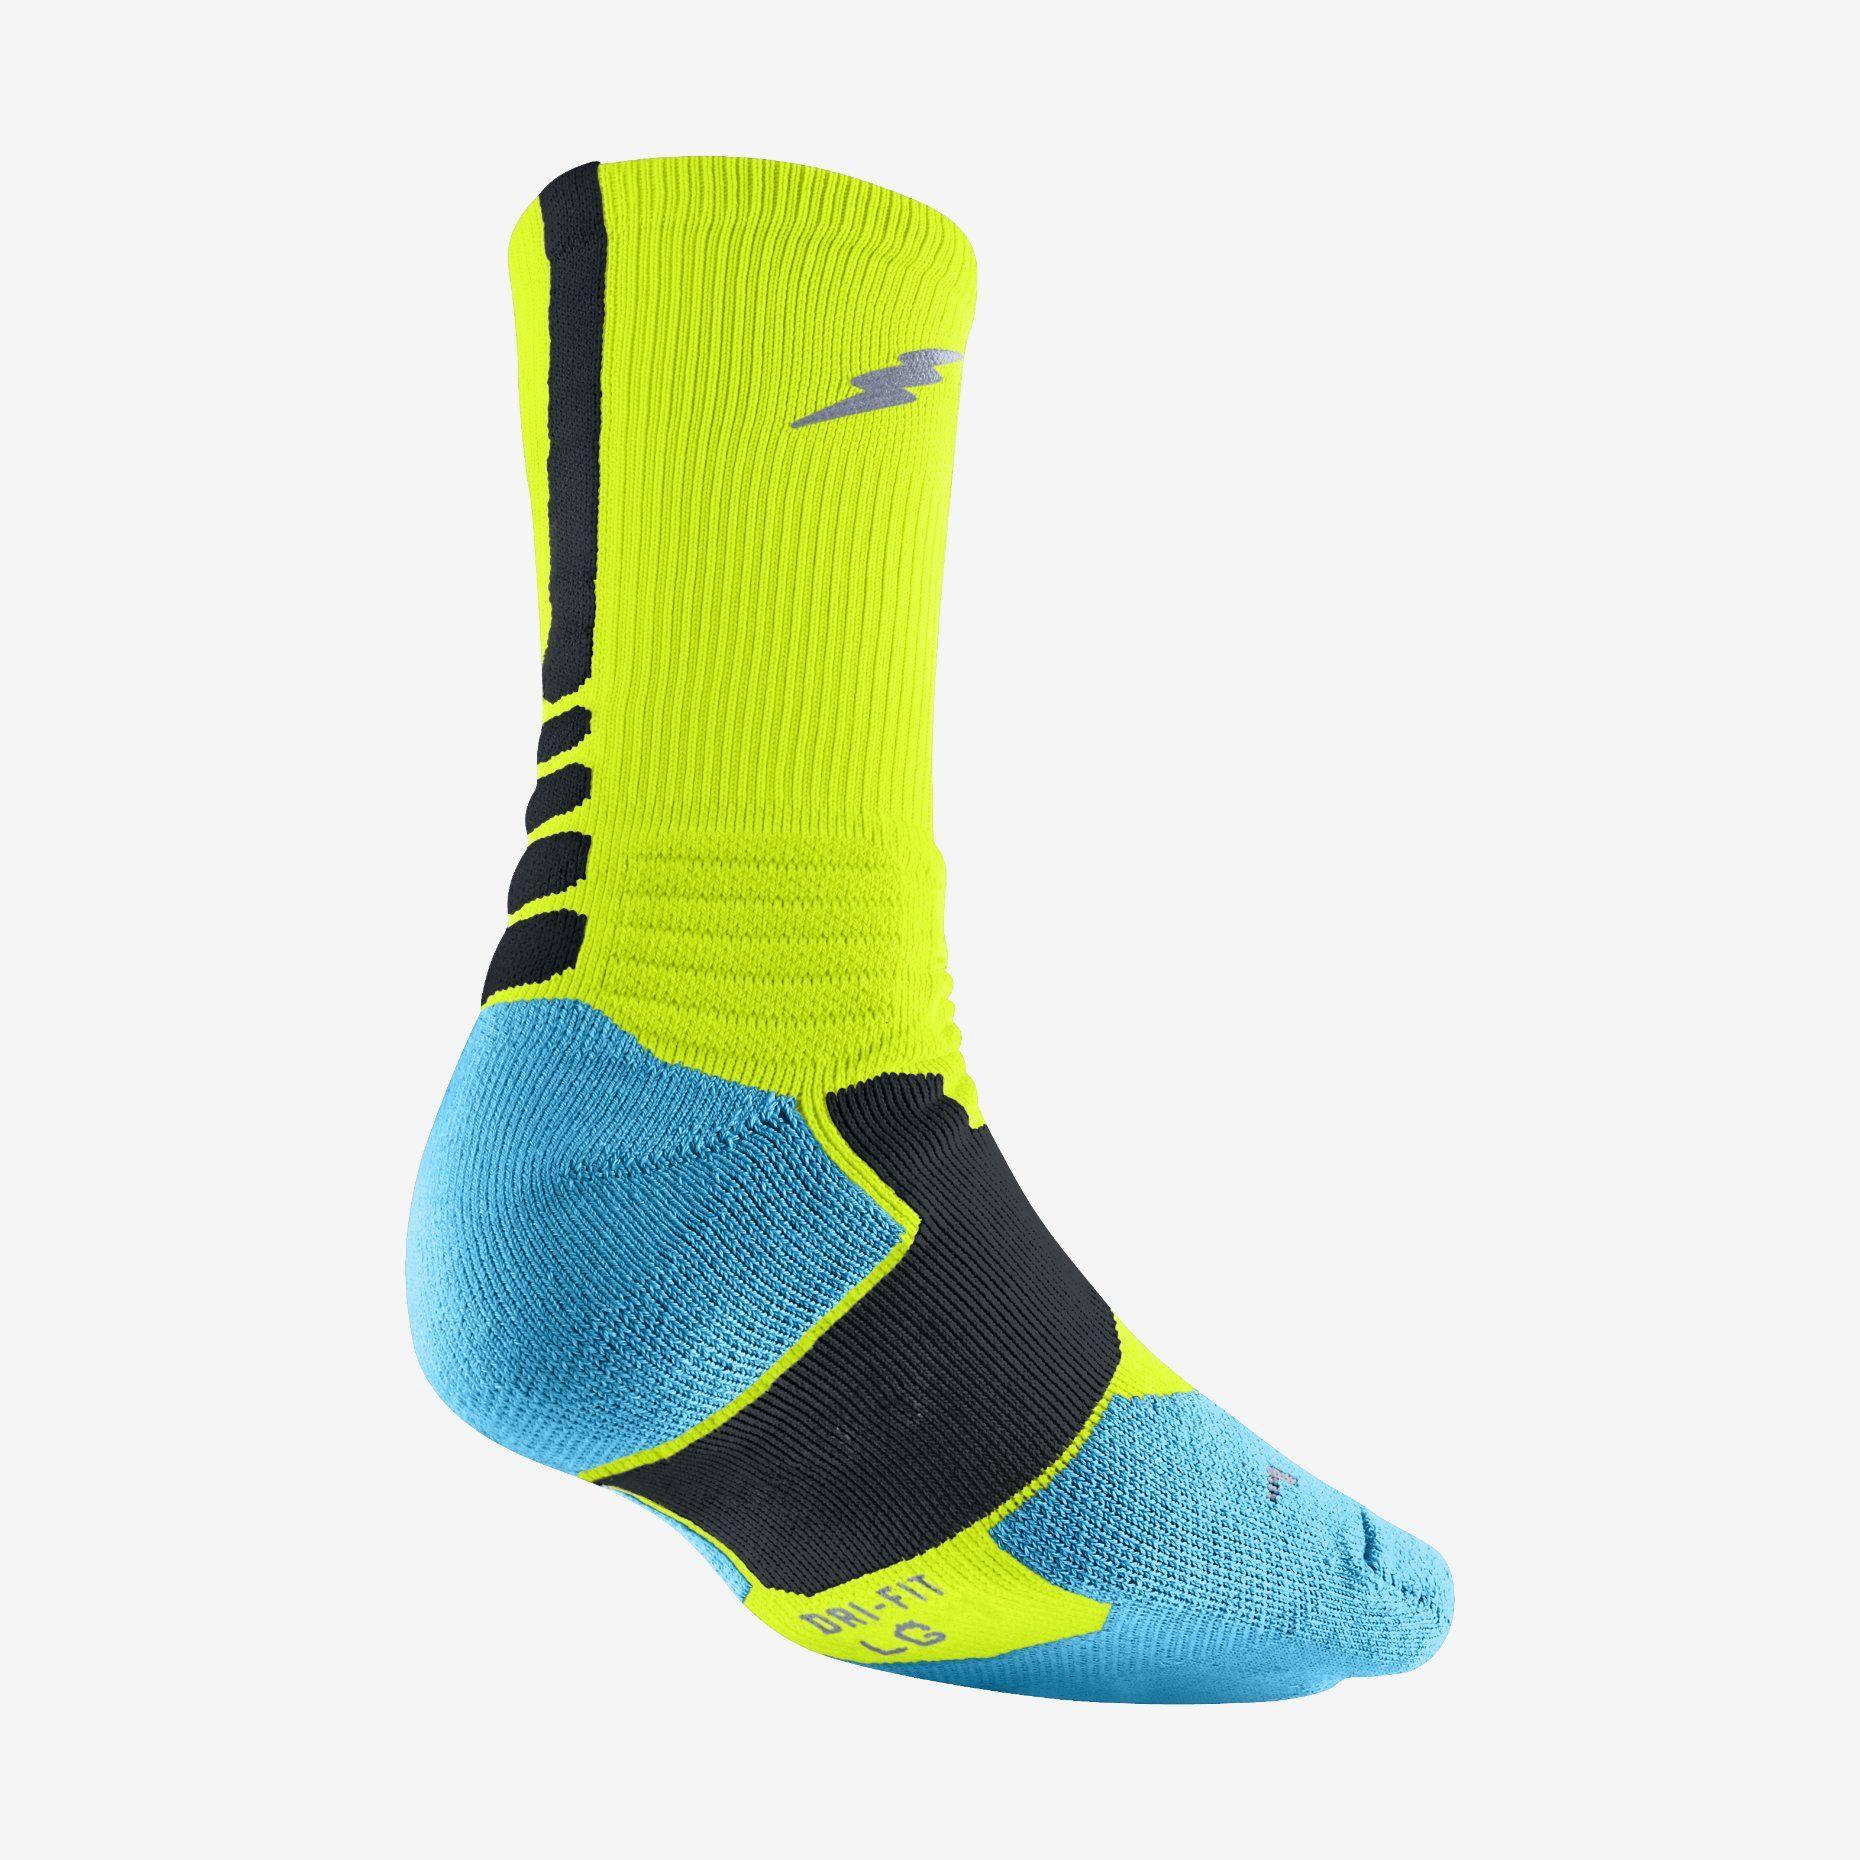 kd 6 sock - black volt away II. Nike Elite SocksNike ...